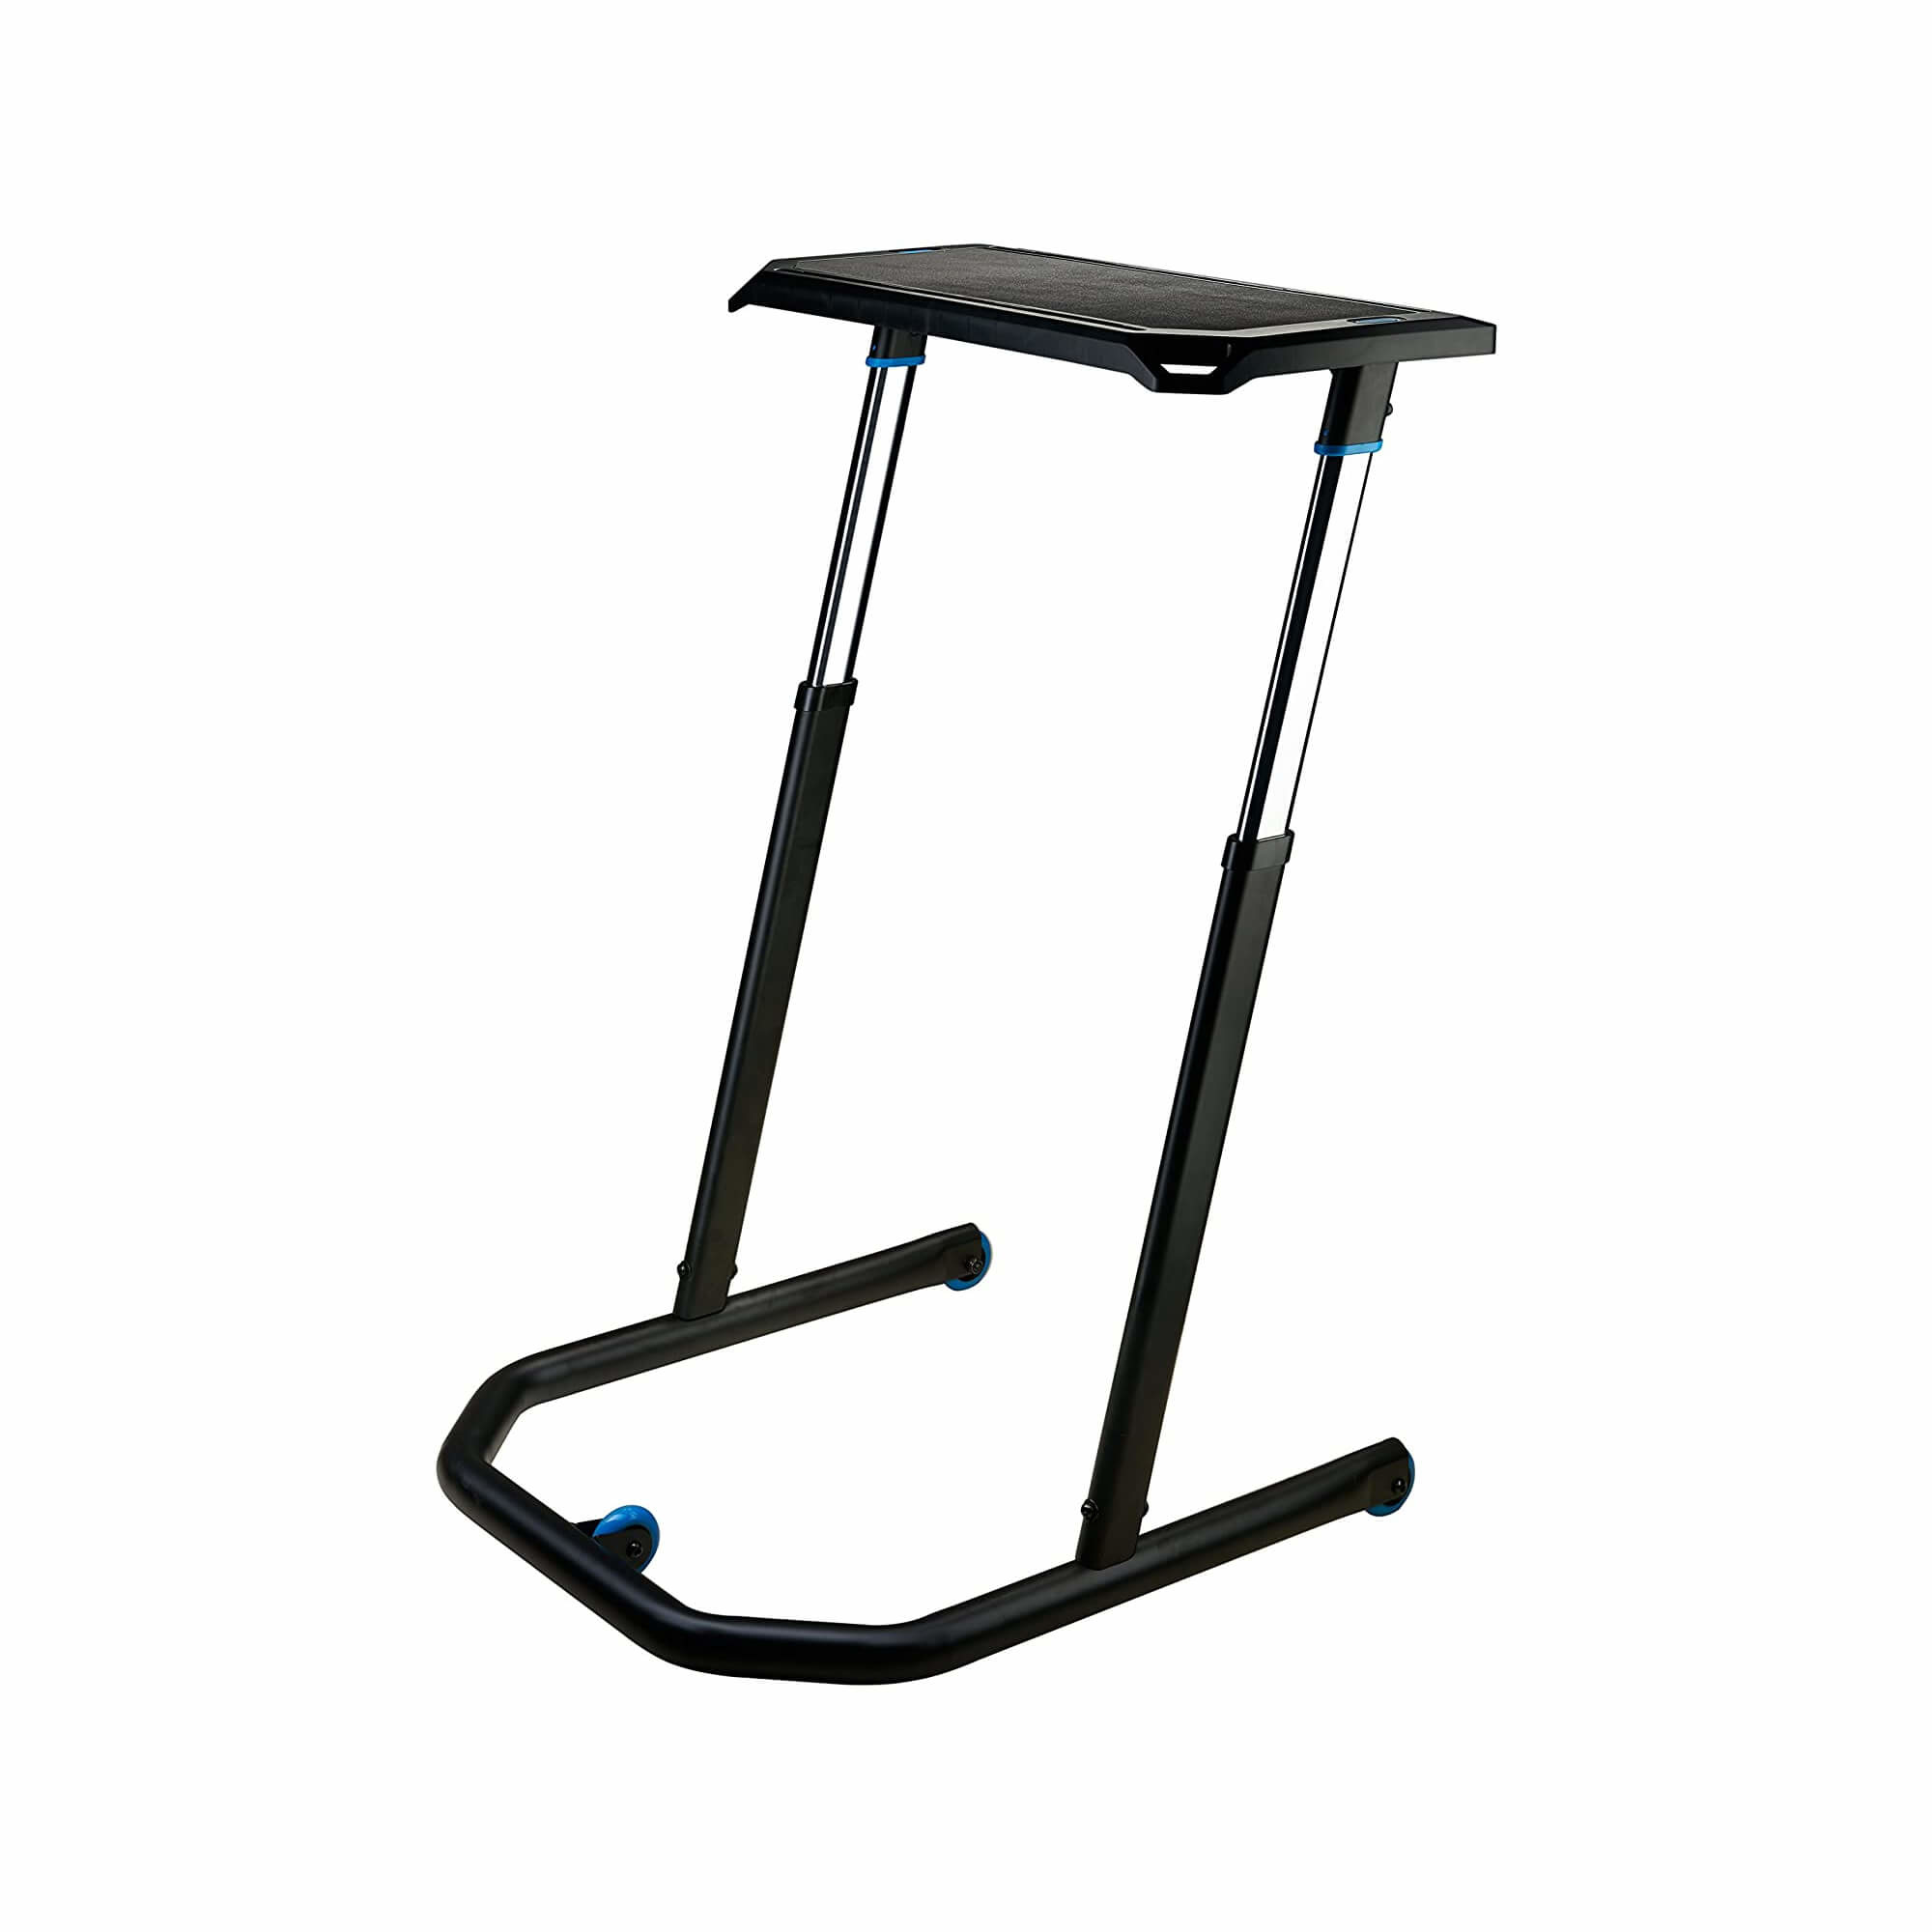 Kickr Fitness Desk-1